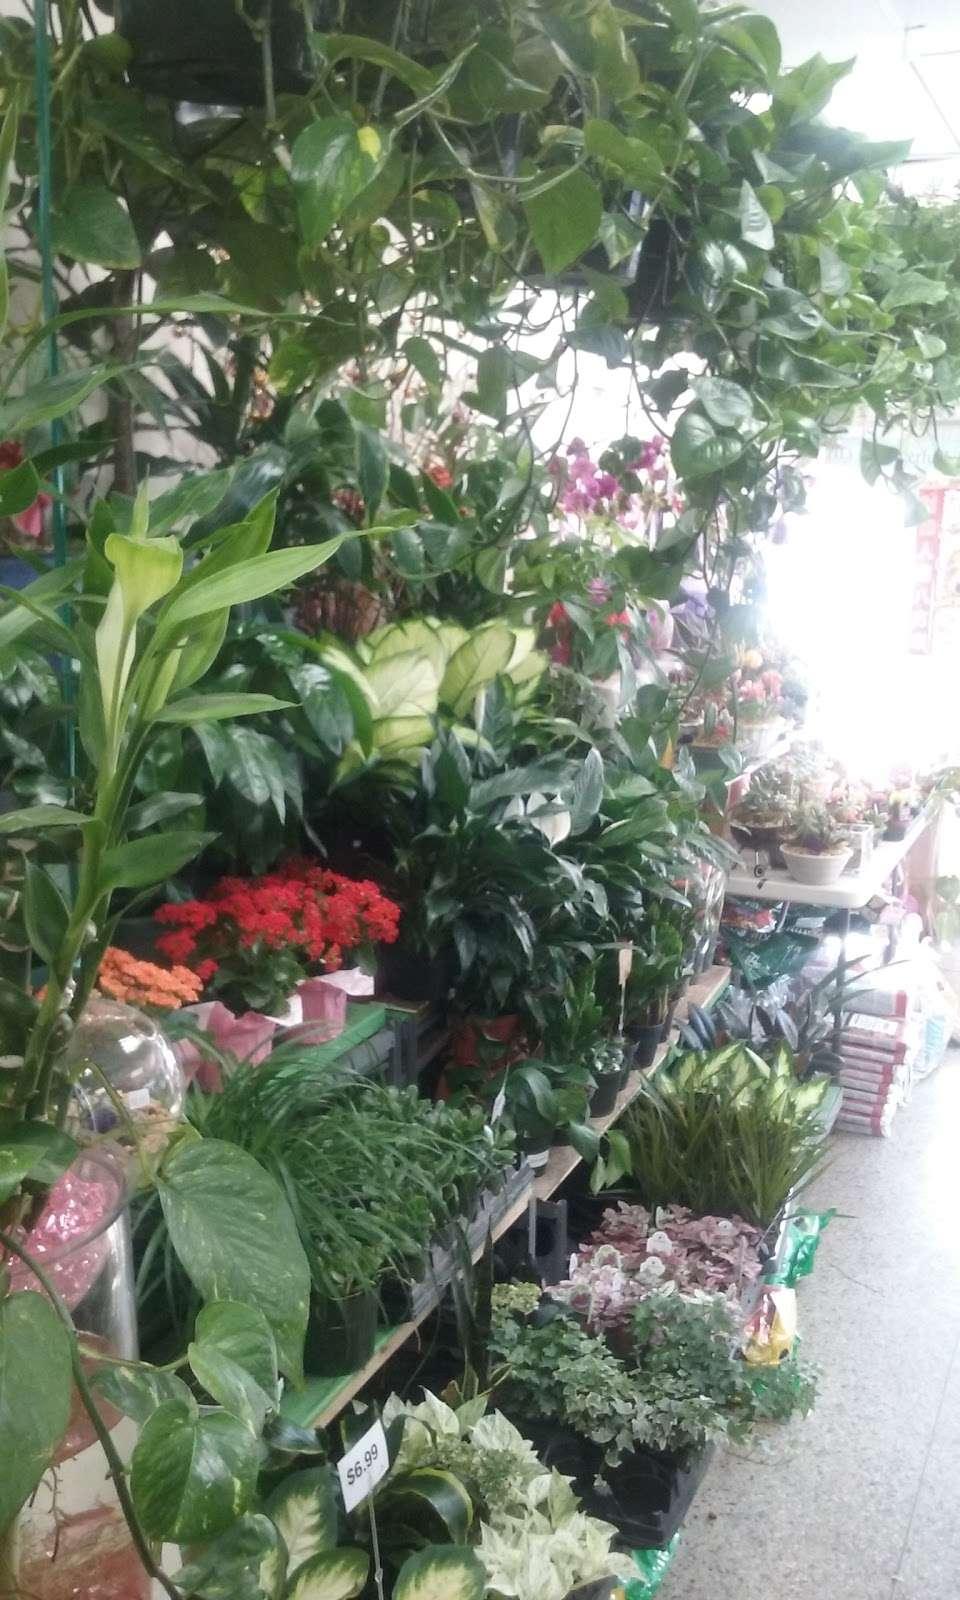 Creative Florist - florist    Photo 8 of 10   Address: 93-01 63rd Dr, Rego Park, NY 11374, USA   Phone: (718) 459-9292